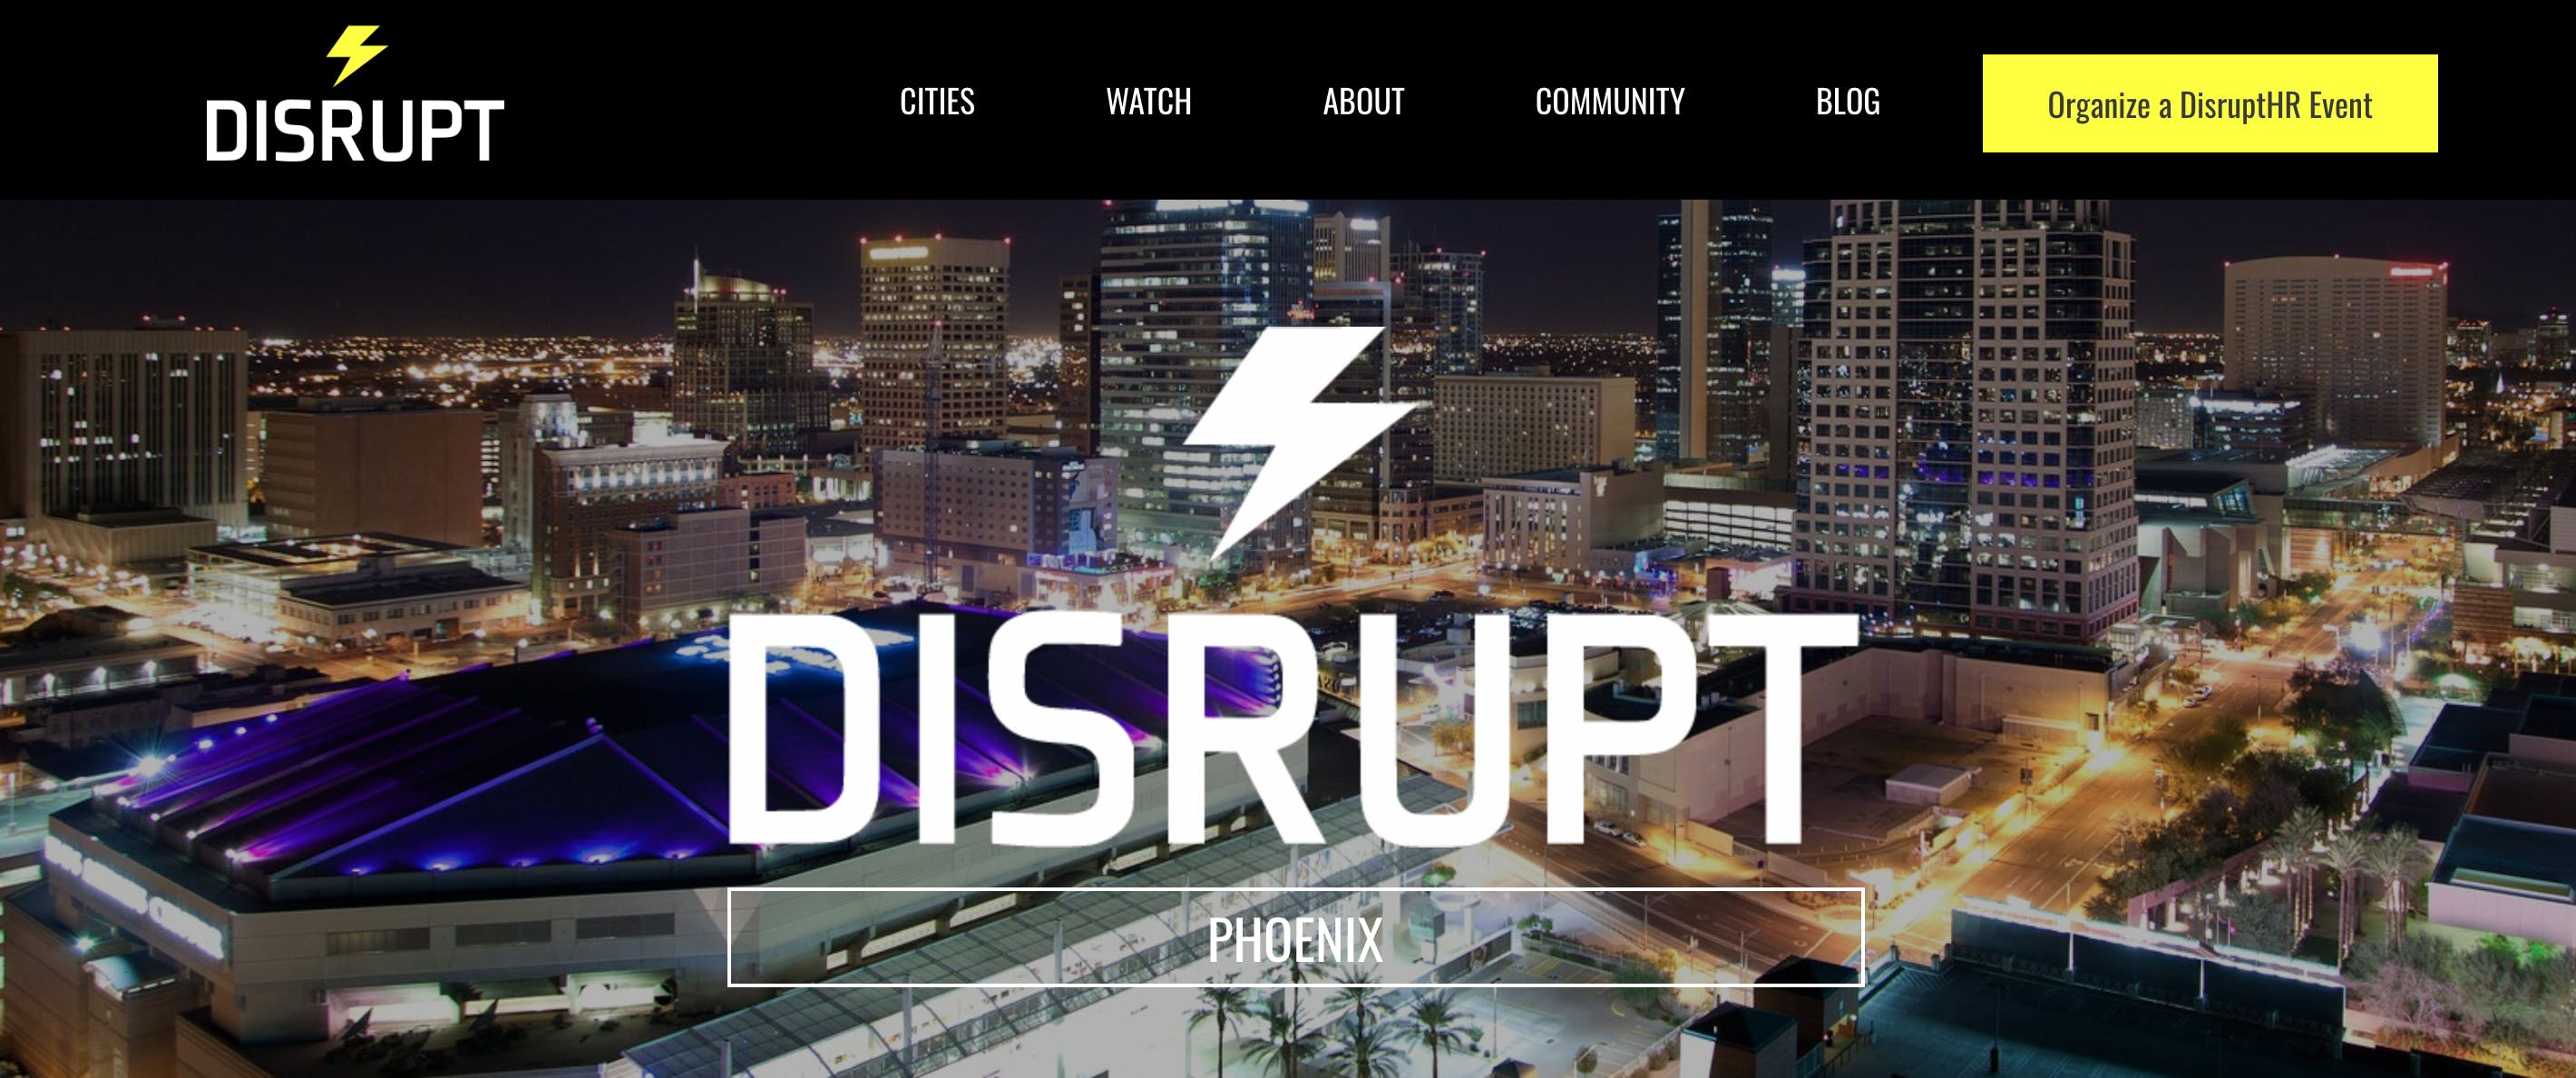 DisruptHR Phoenix 4.0